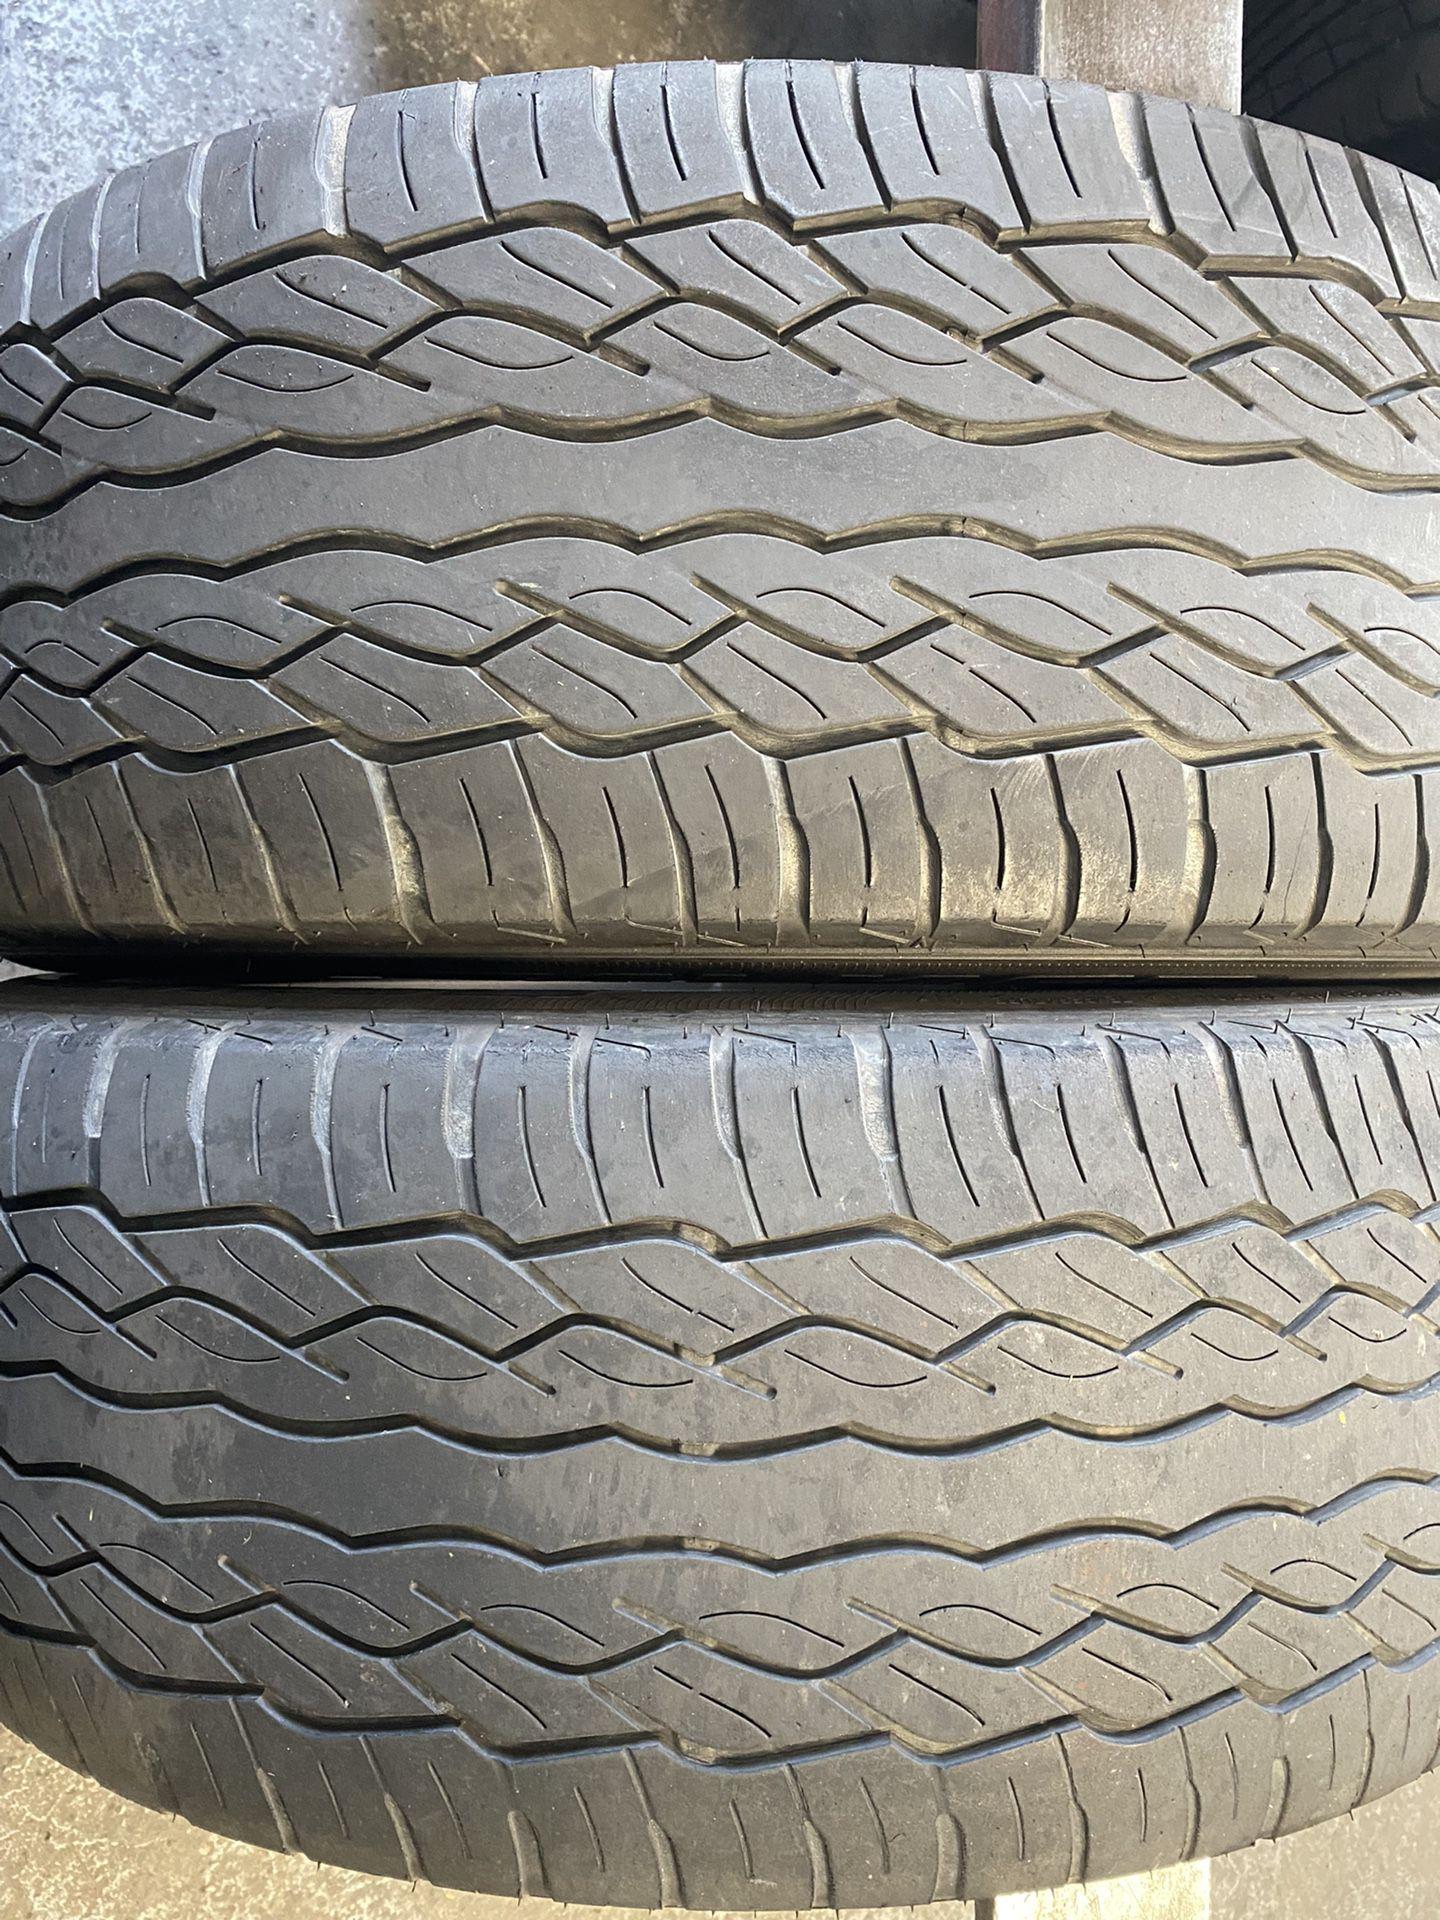 285/45/22 Falken (2 Tires) $80.00/ Both